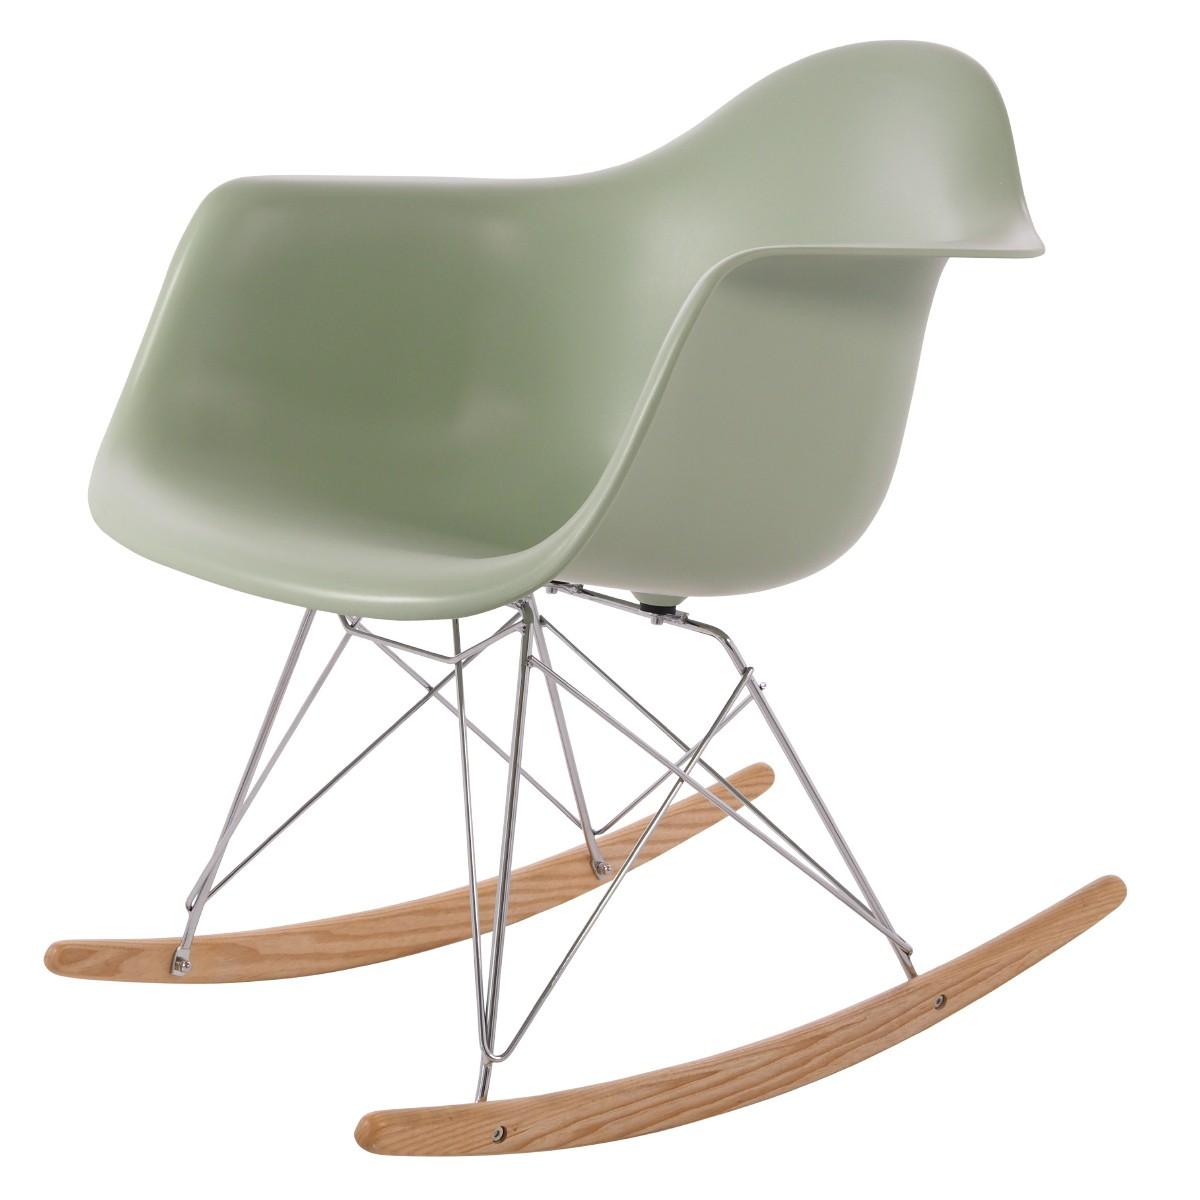 Eames Schommelstoel Babykamer.Charles Eames Schommelstoel Rar Chroom Frame Schommelstoel Design